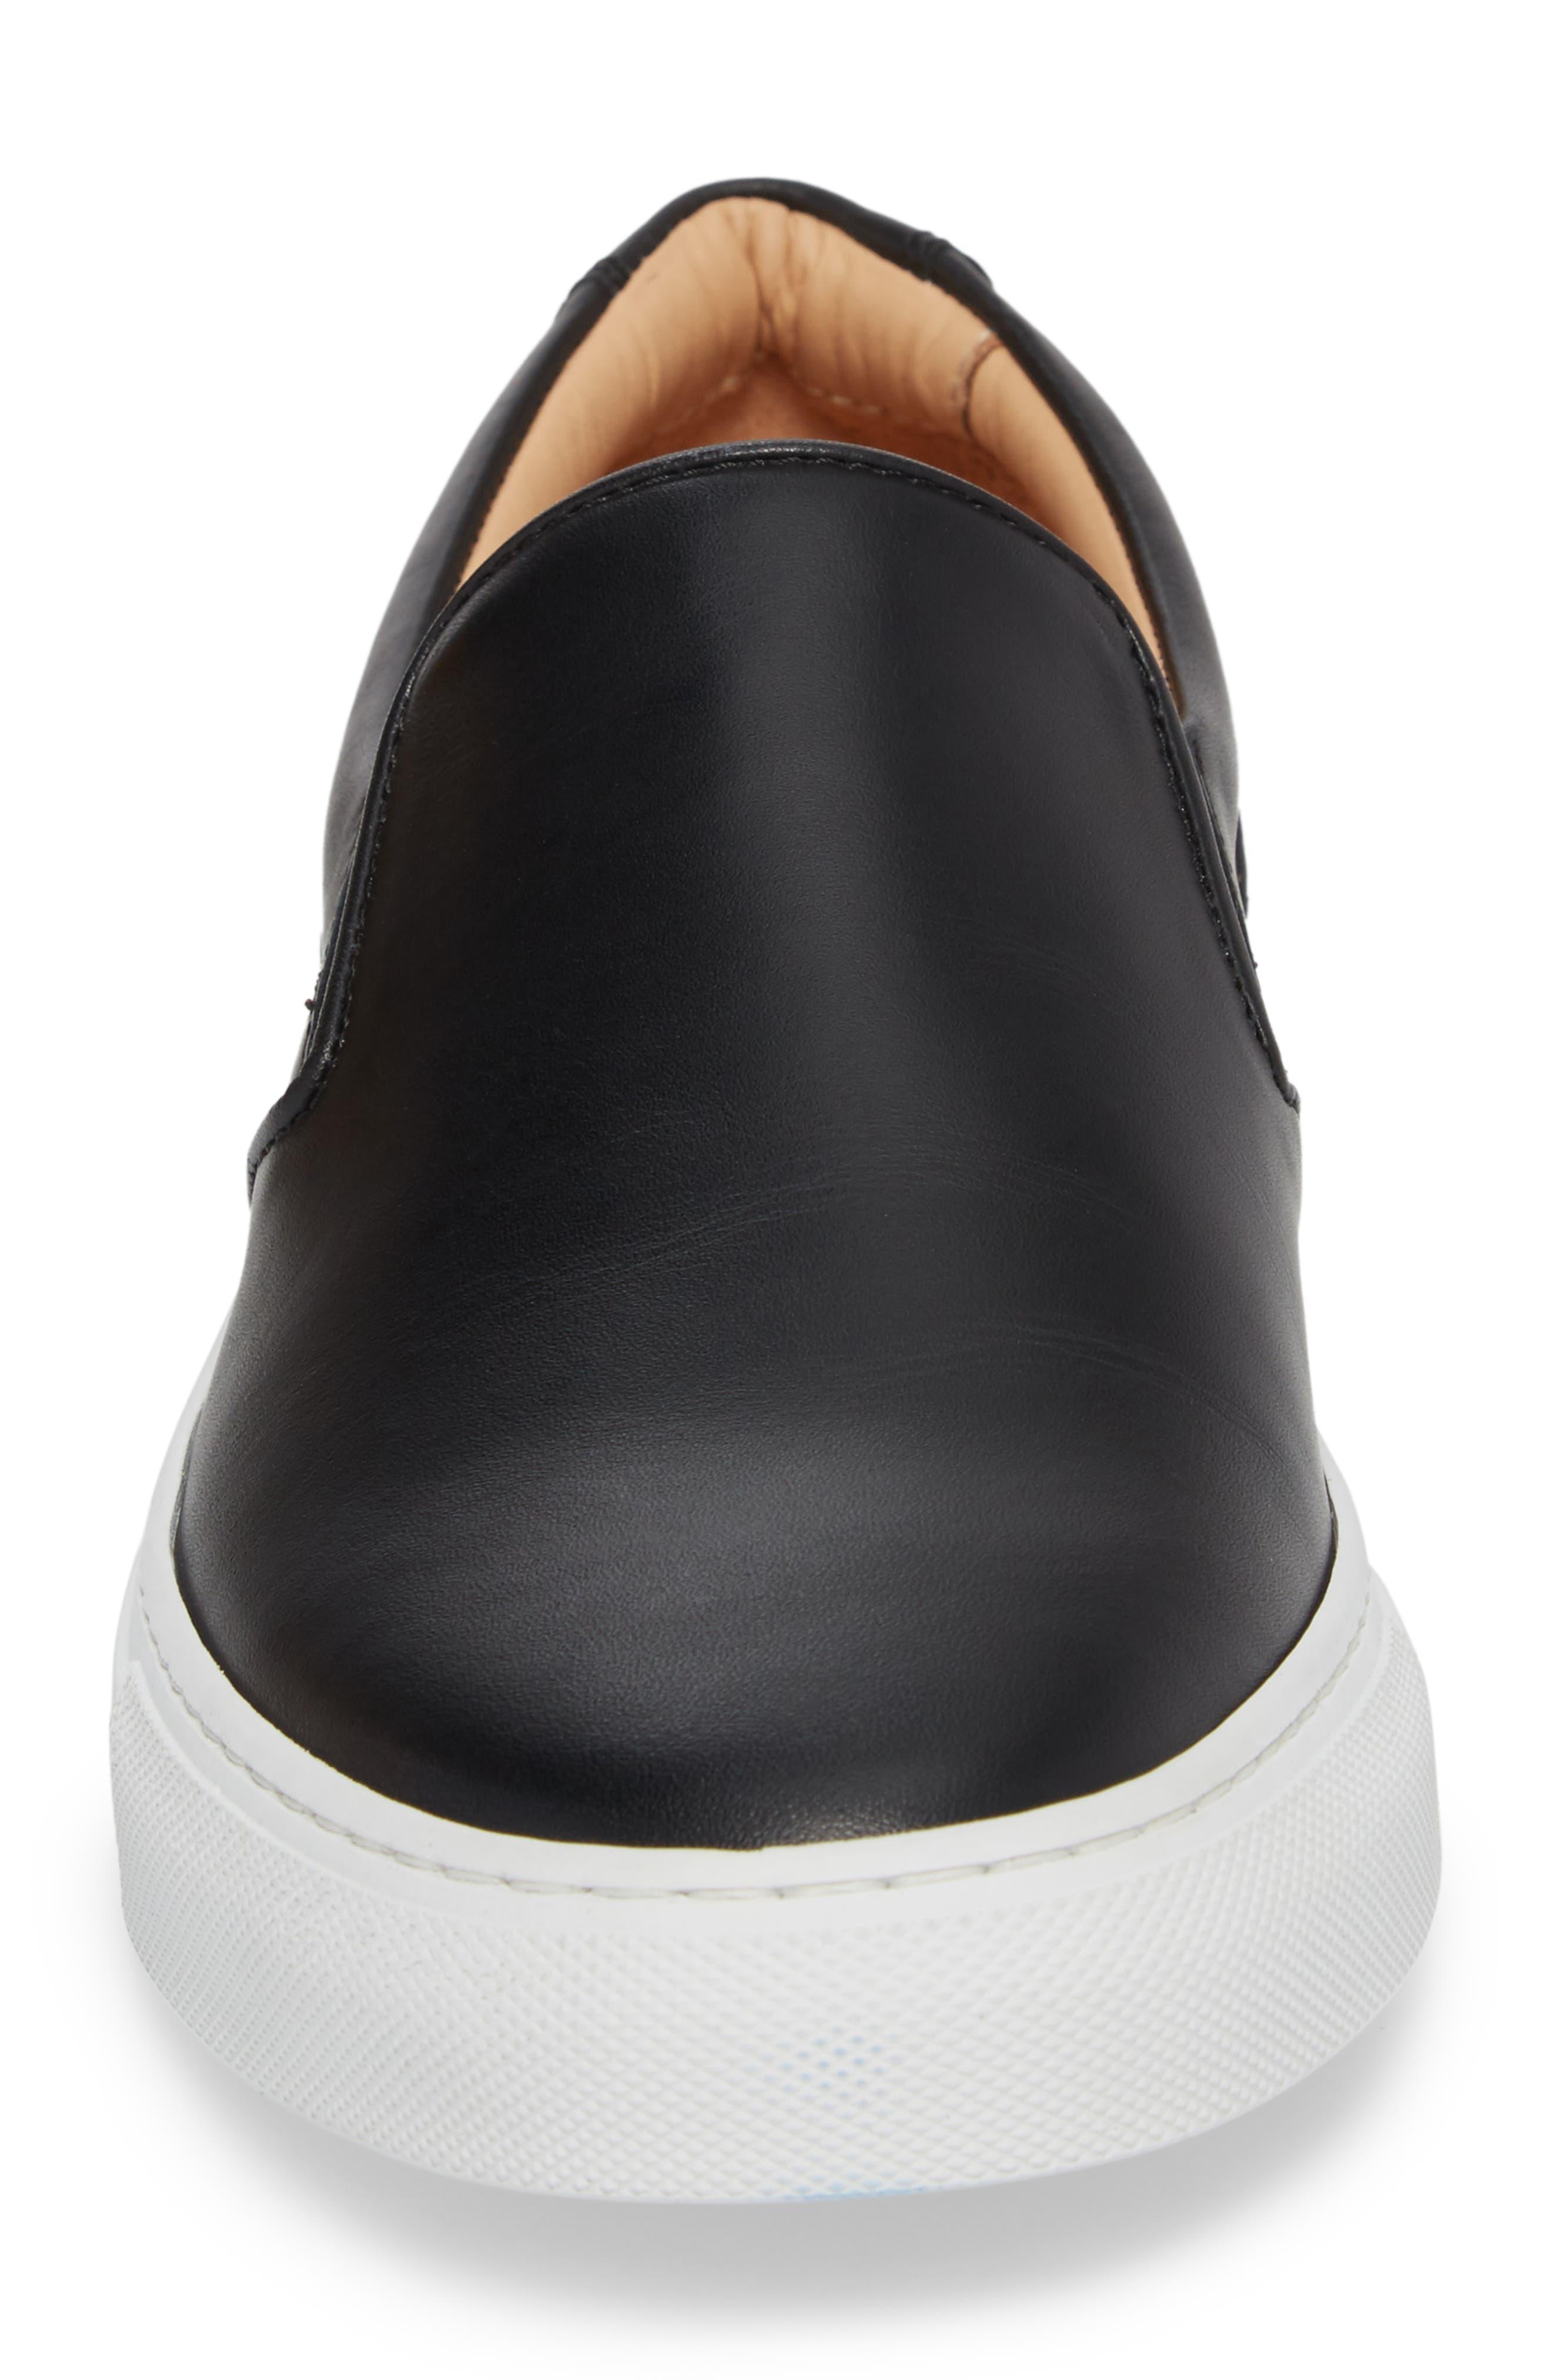 Wooster Slip-On Sneaker,                             Alternate thumbnail 4, color,                             Black Leather